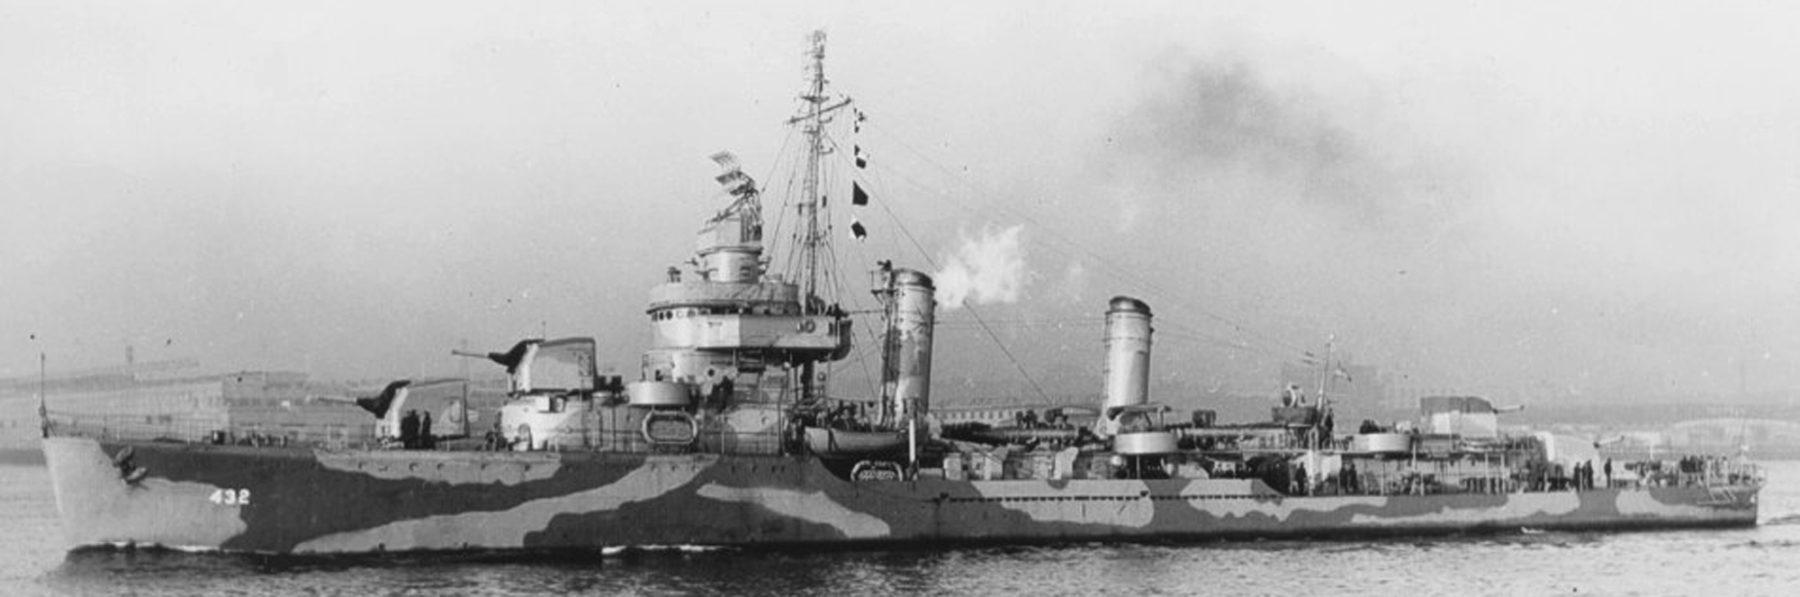 WW2 American destroyers